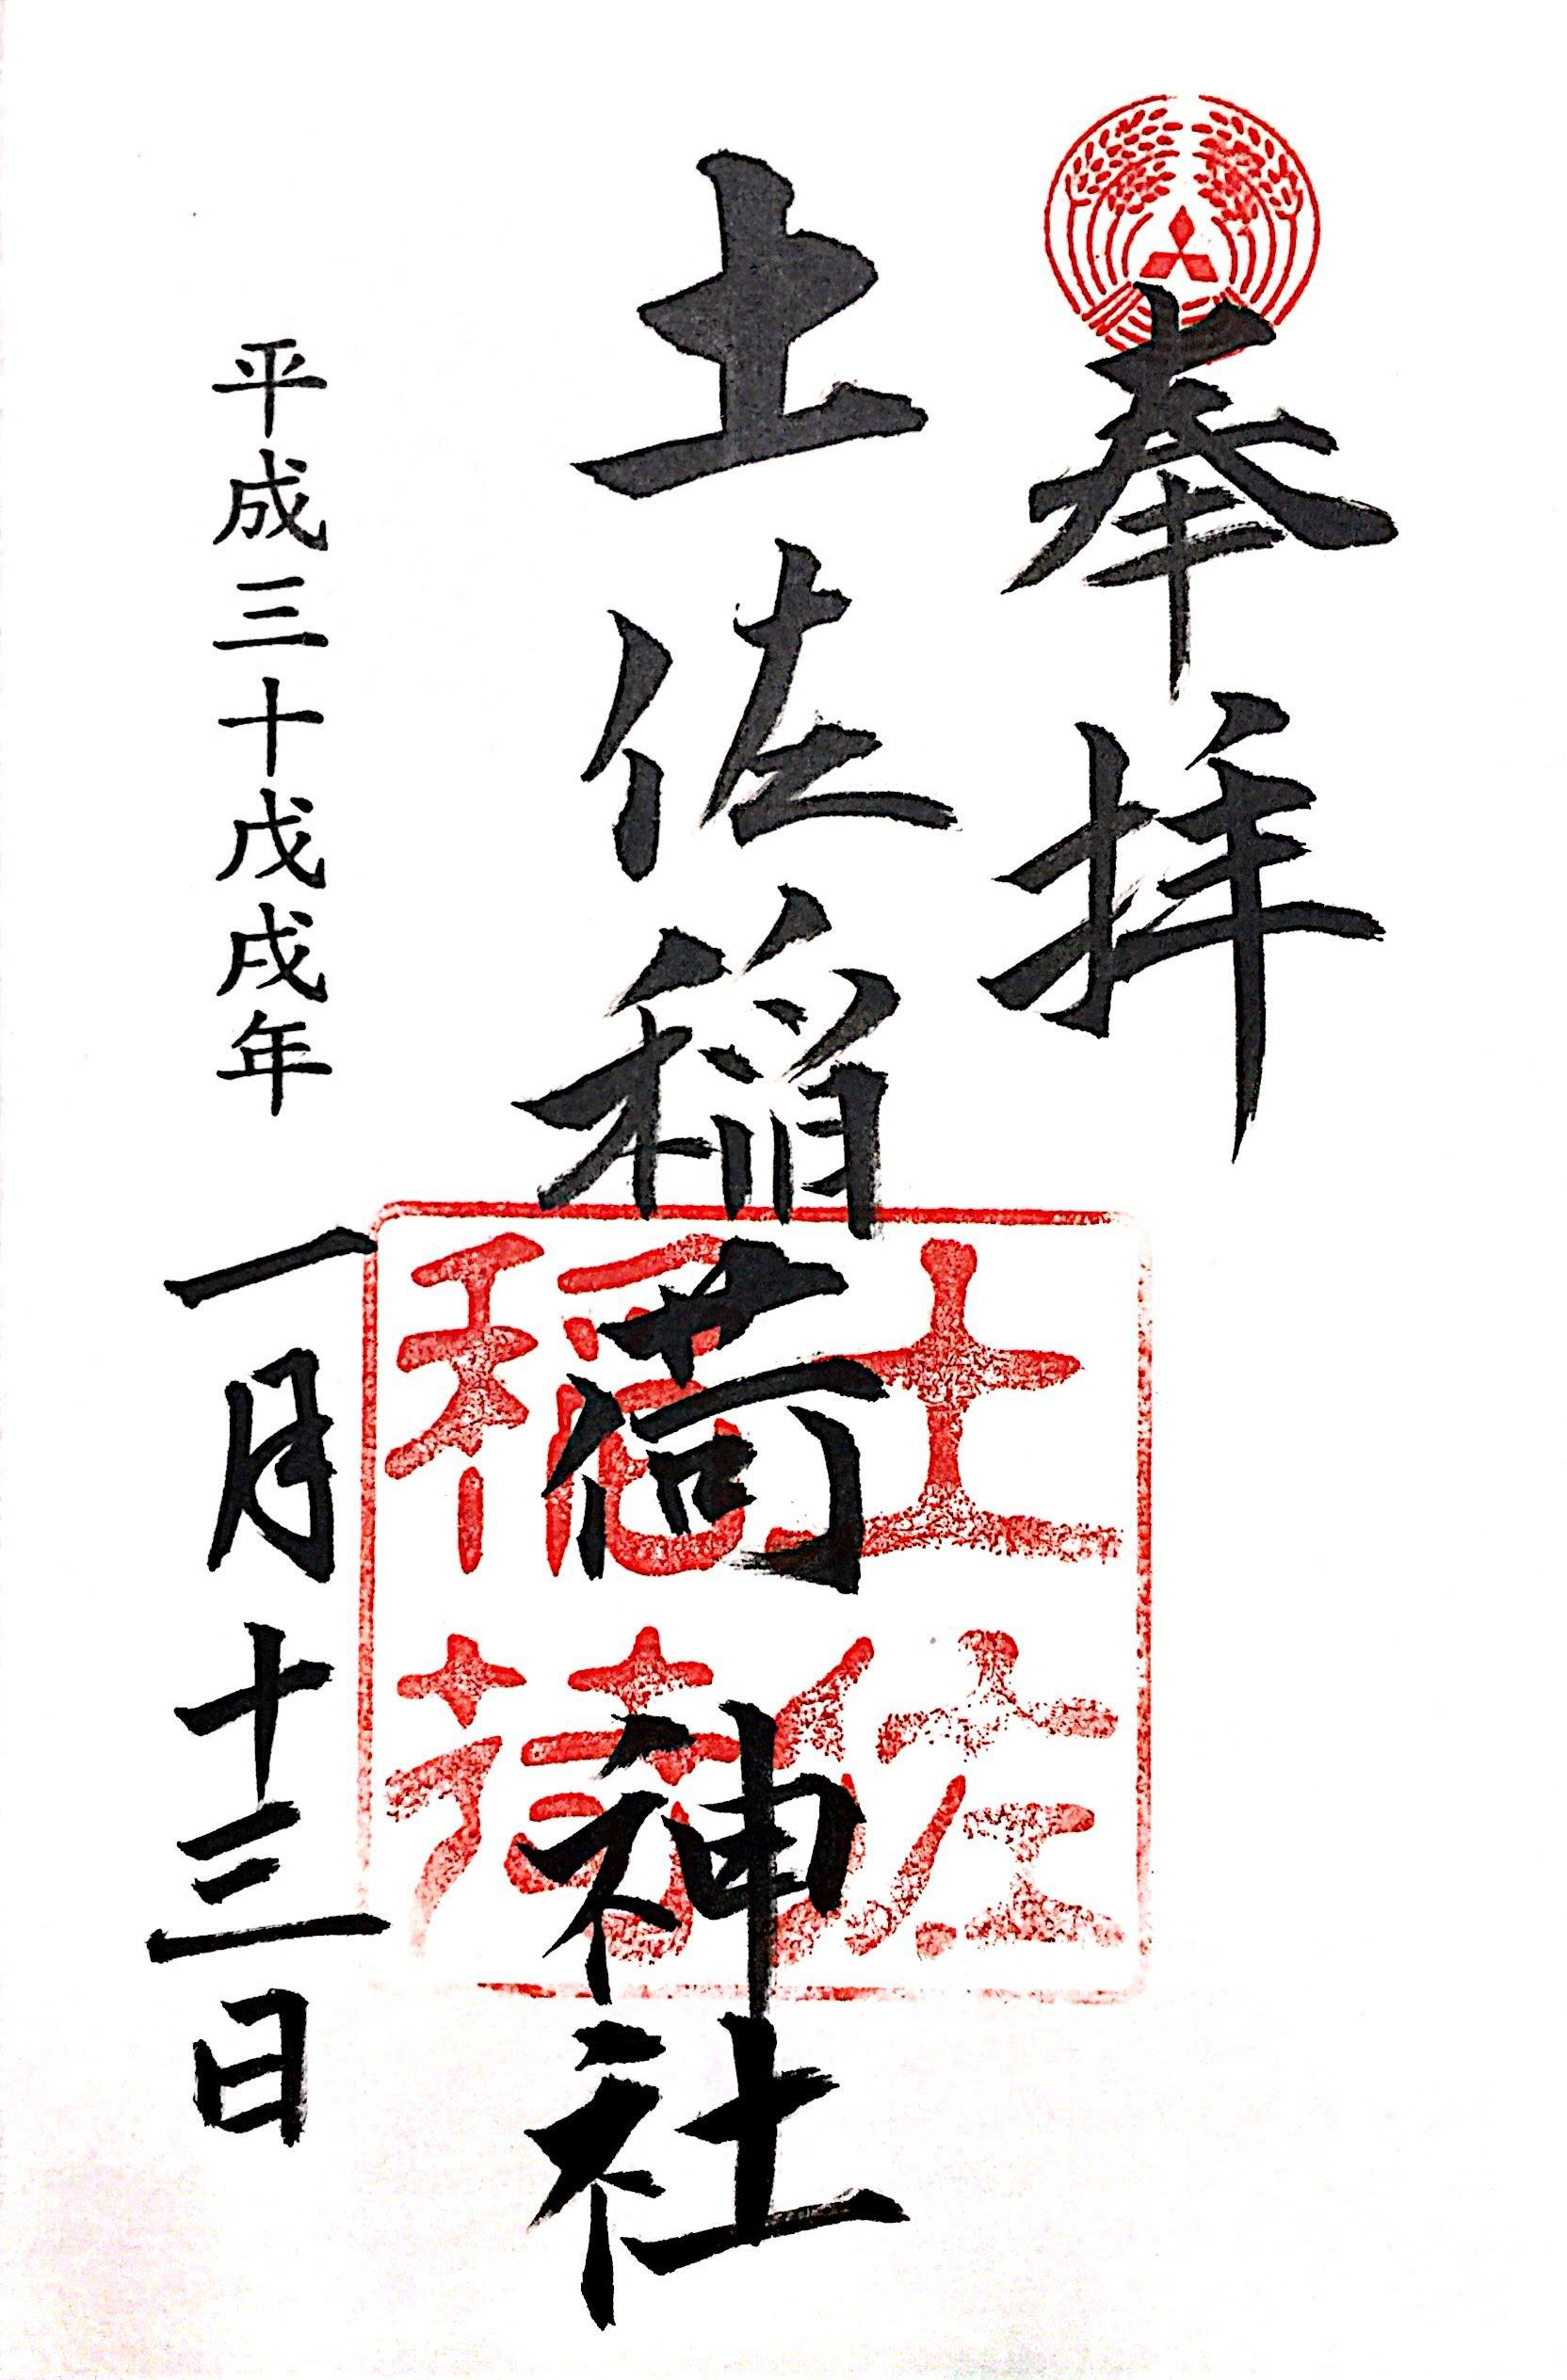 土佐稲荷神社の御朱印